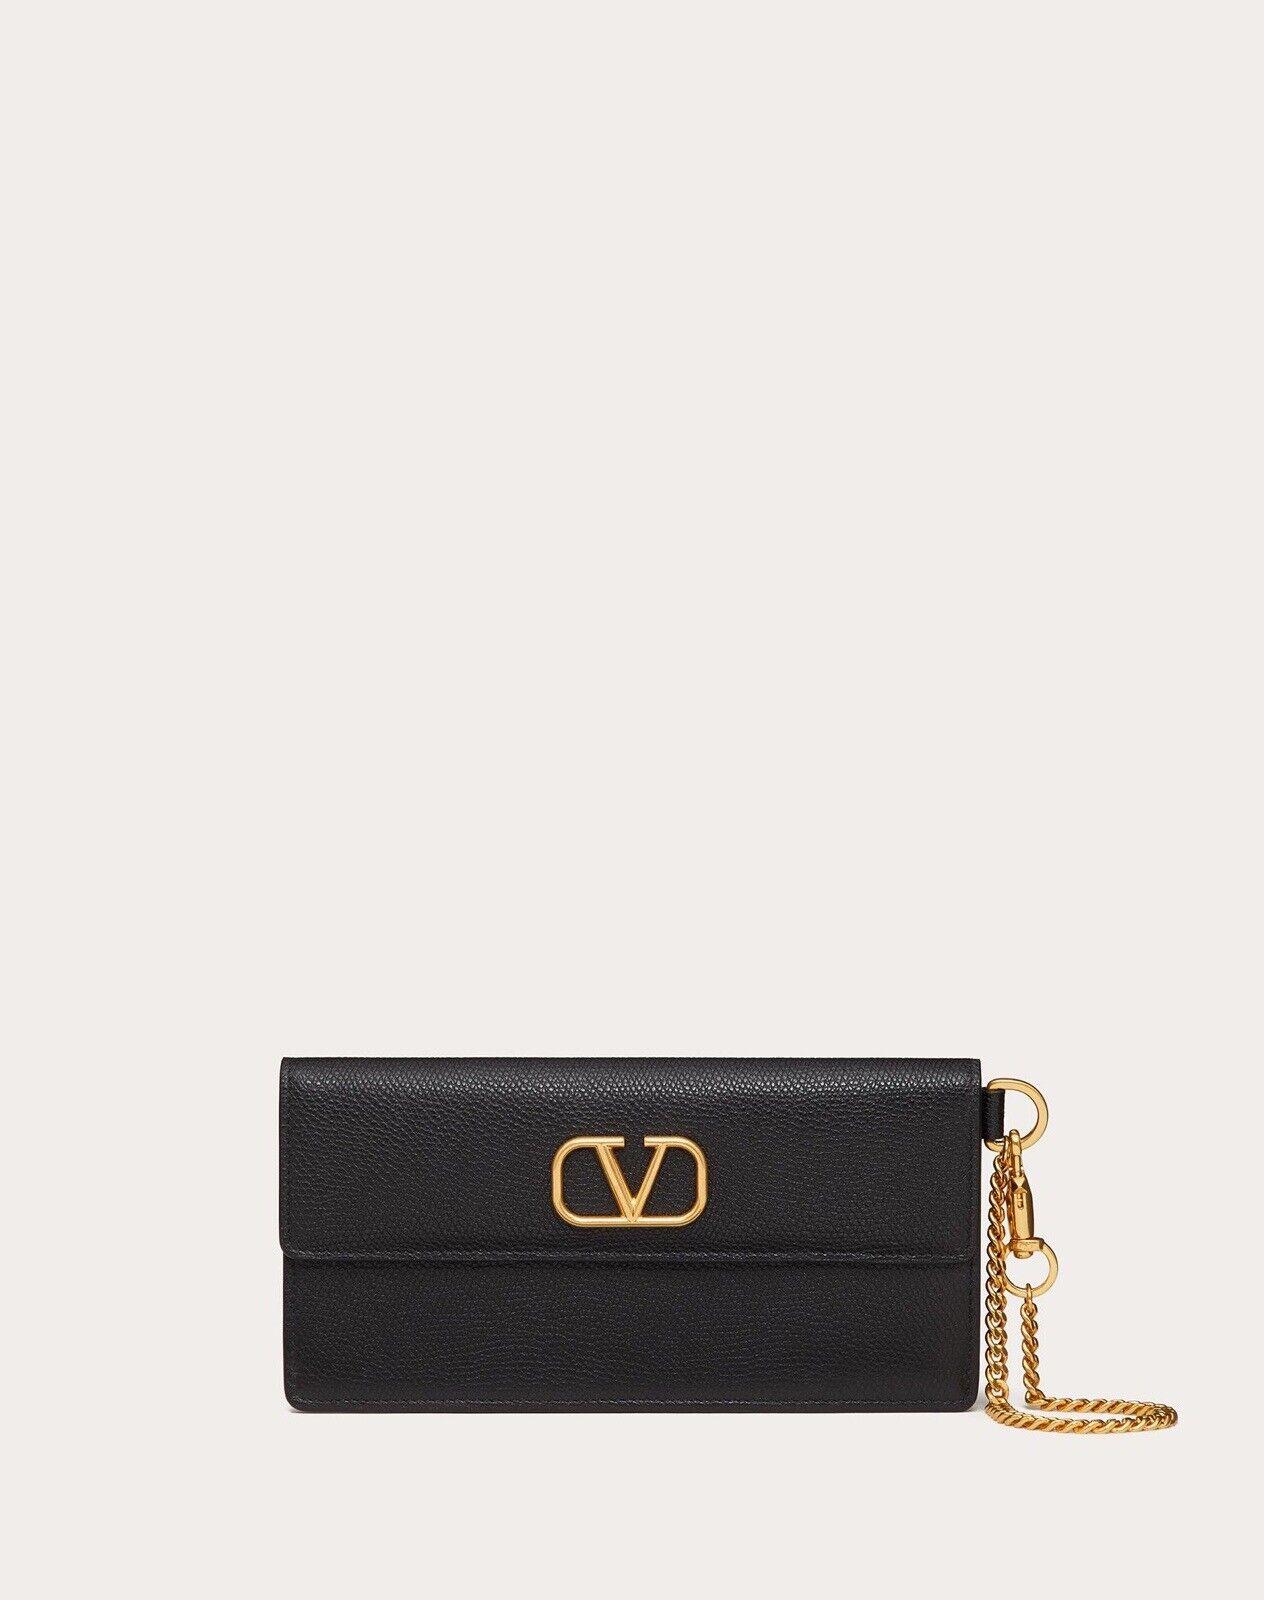 New In Box Valentino Garavani VLOGO Bill Pouch Wallet